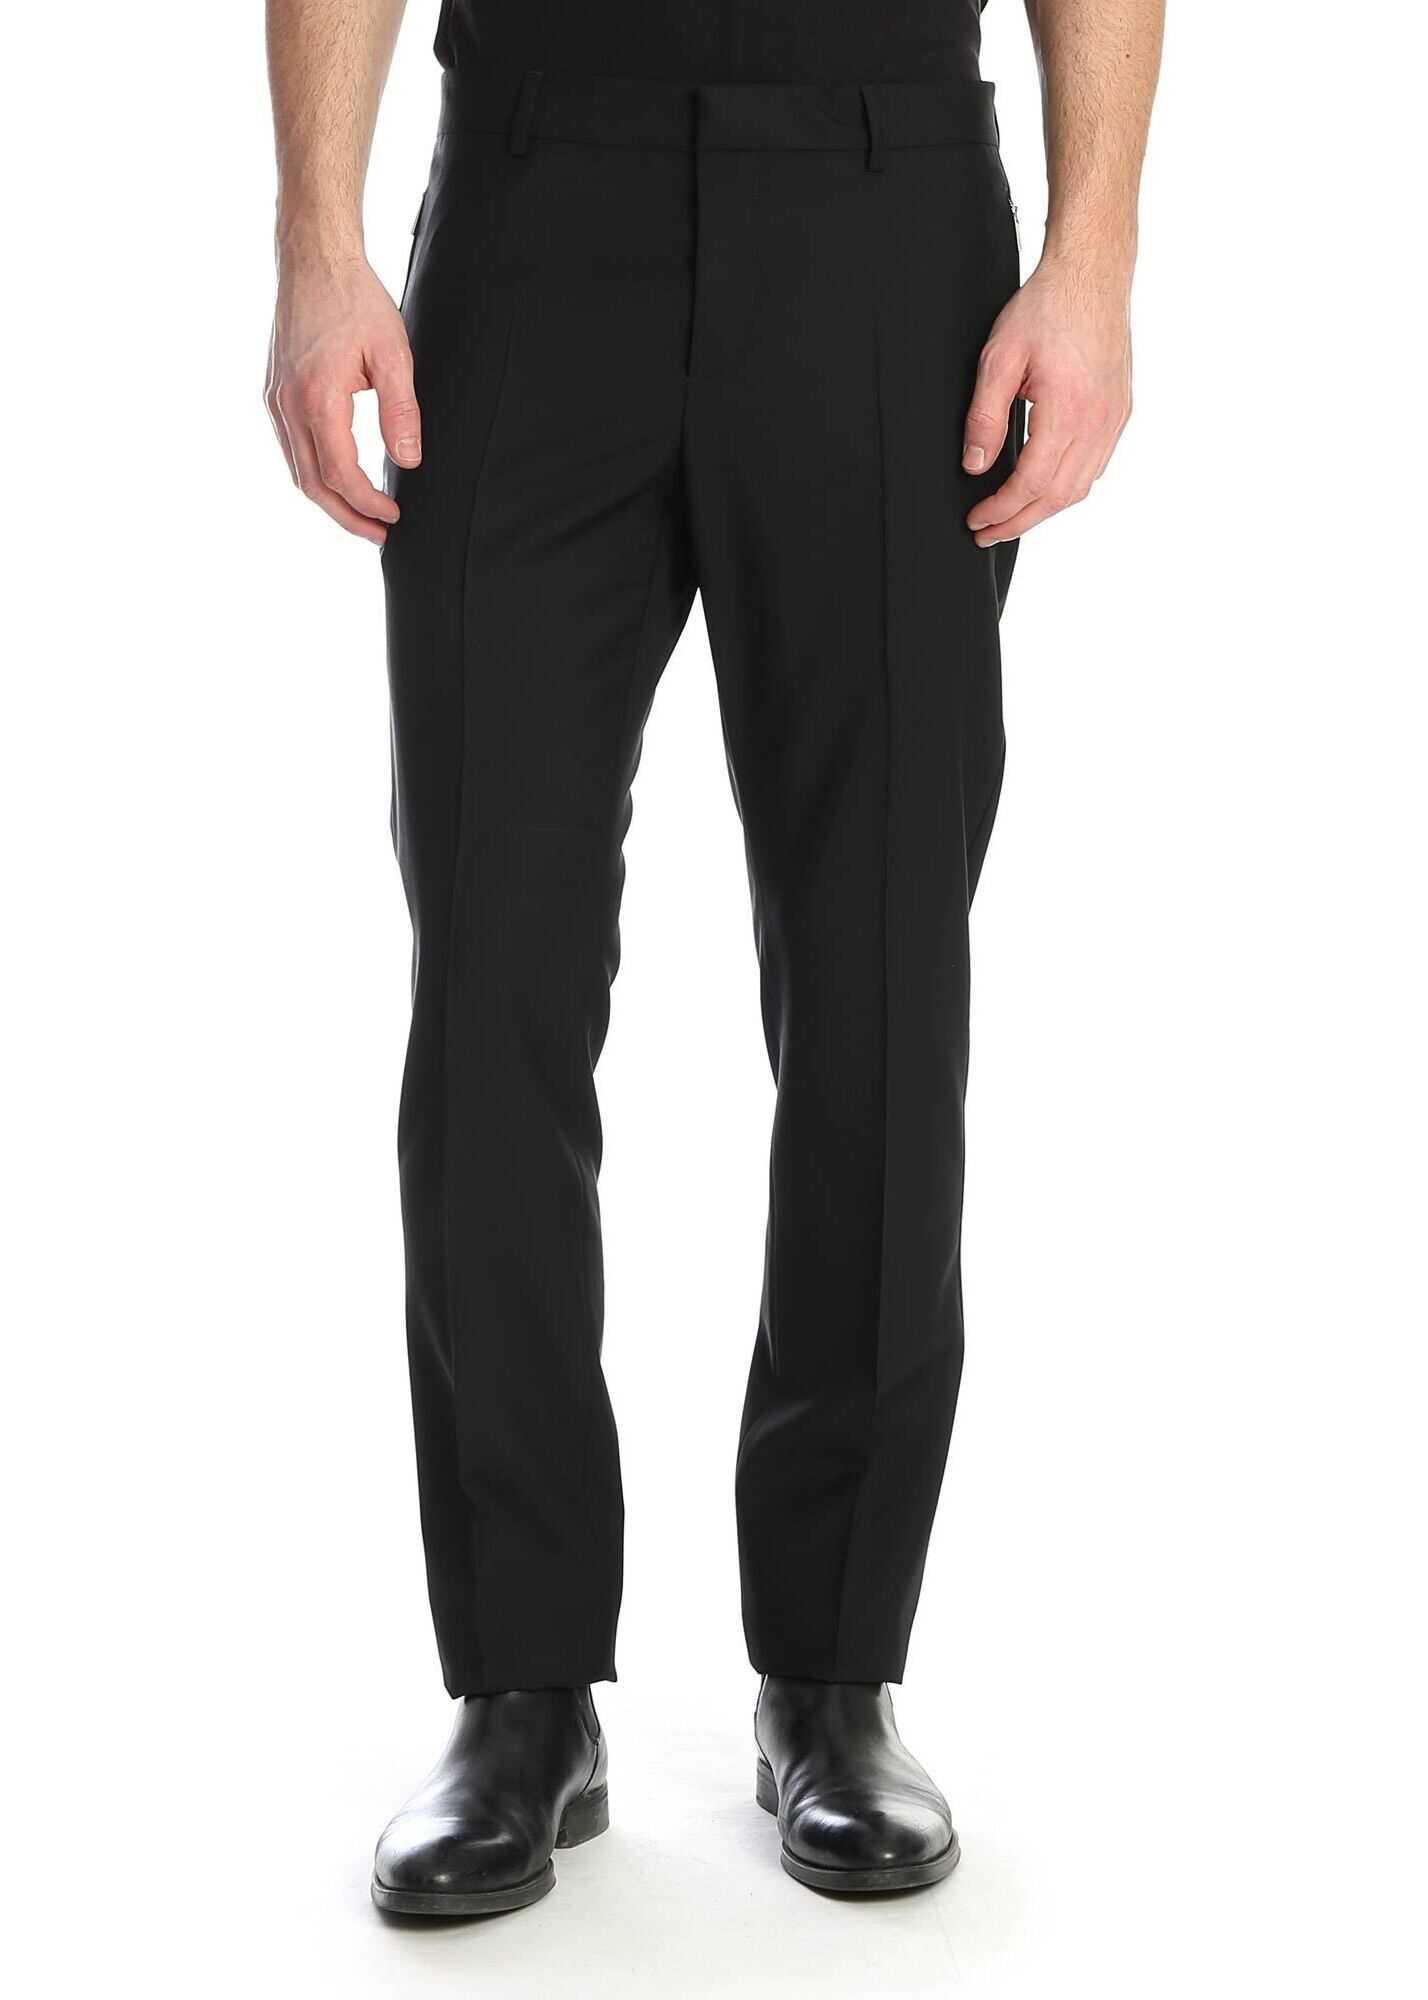 Valentino Garavani Wool Trousers In Black Black imagine